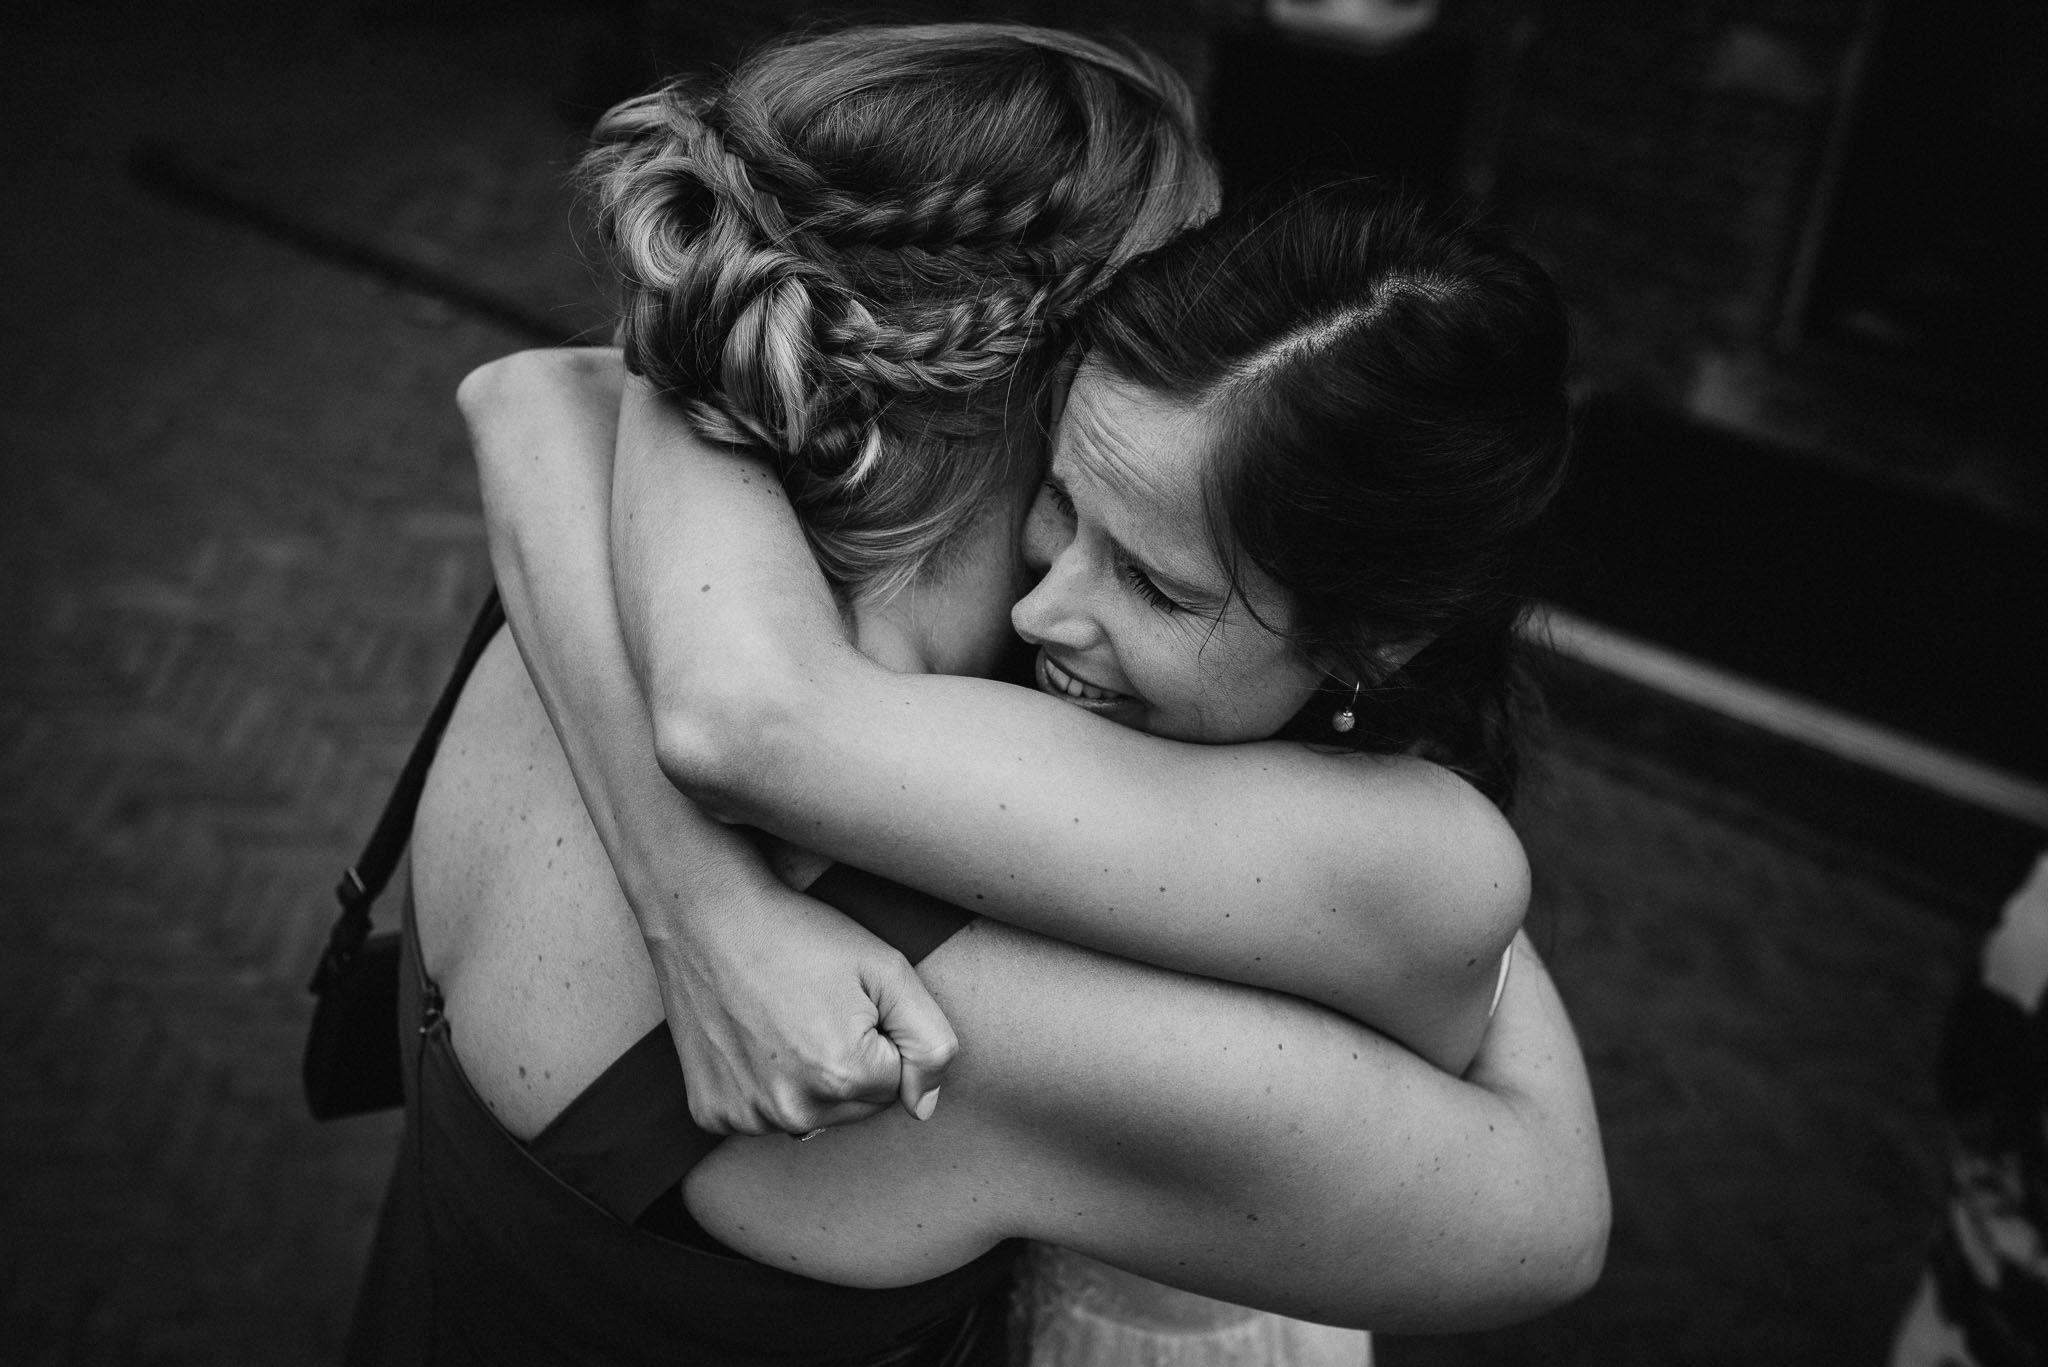 journalistieke bruidsreportage foto's trouwen